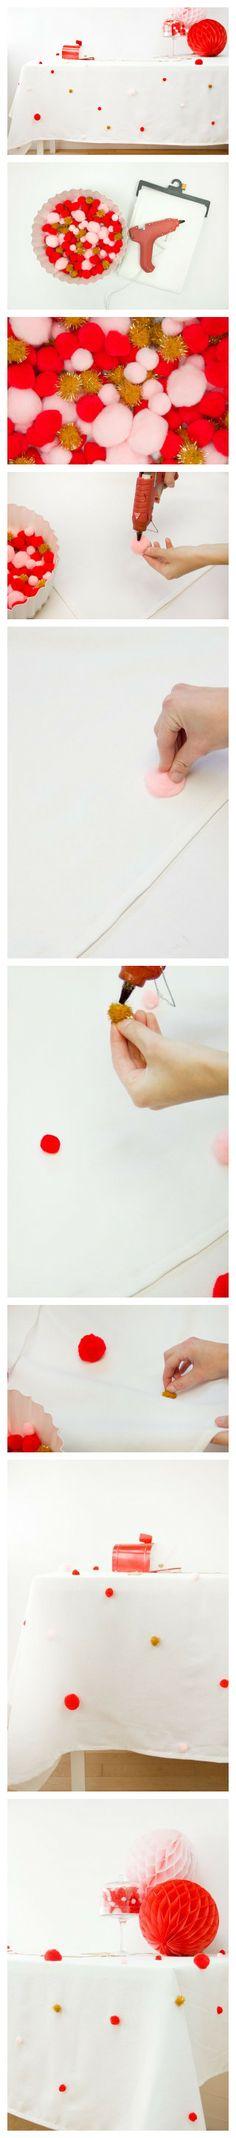 Gotta love a good glue gun + pom pom project!